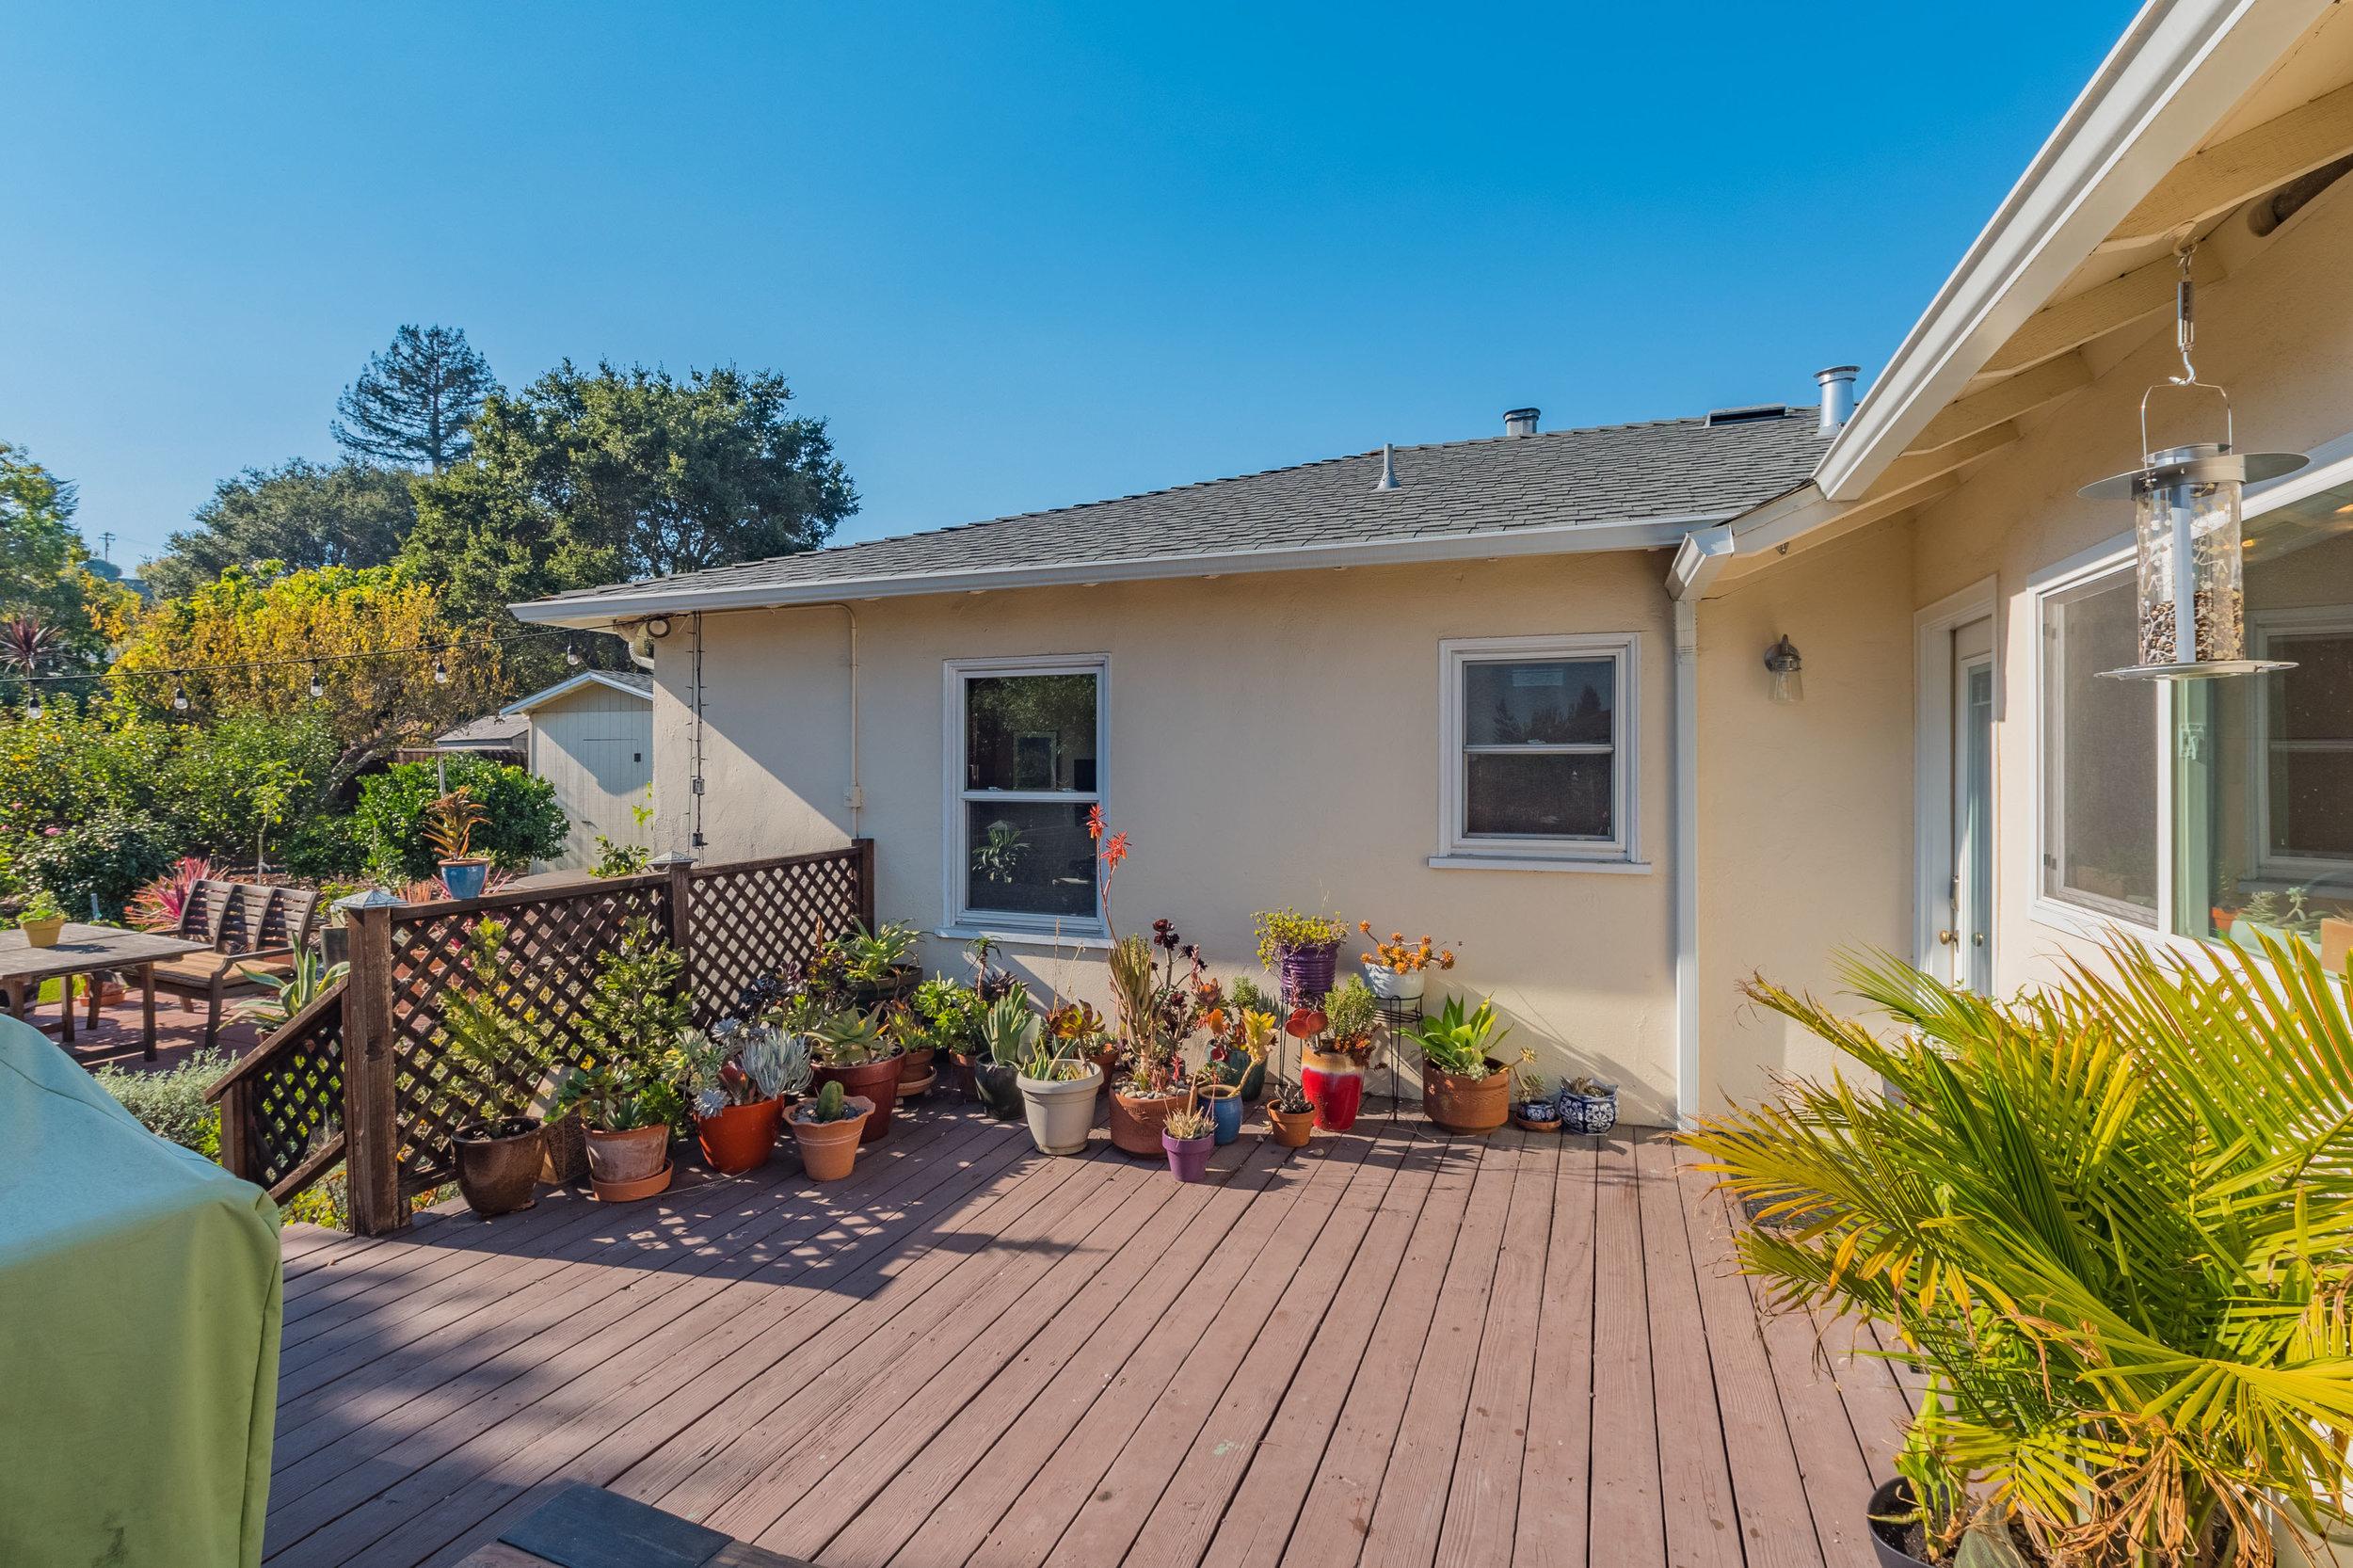 Large and Sunny Backyard